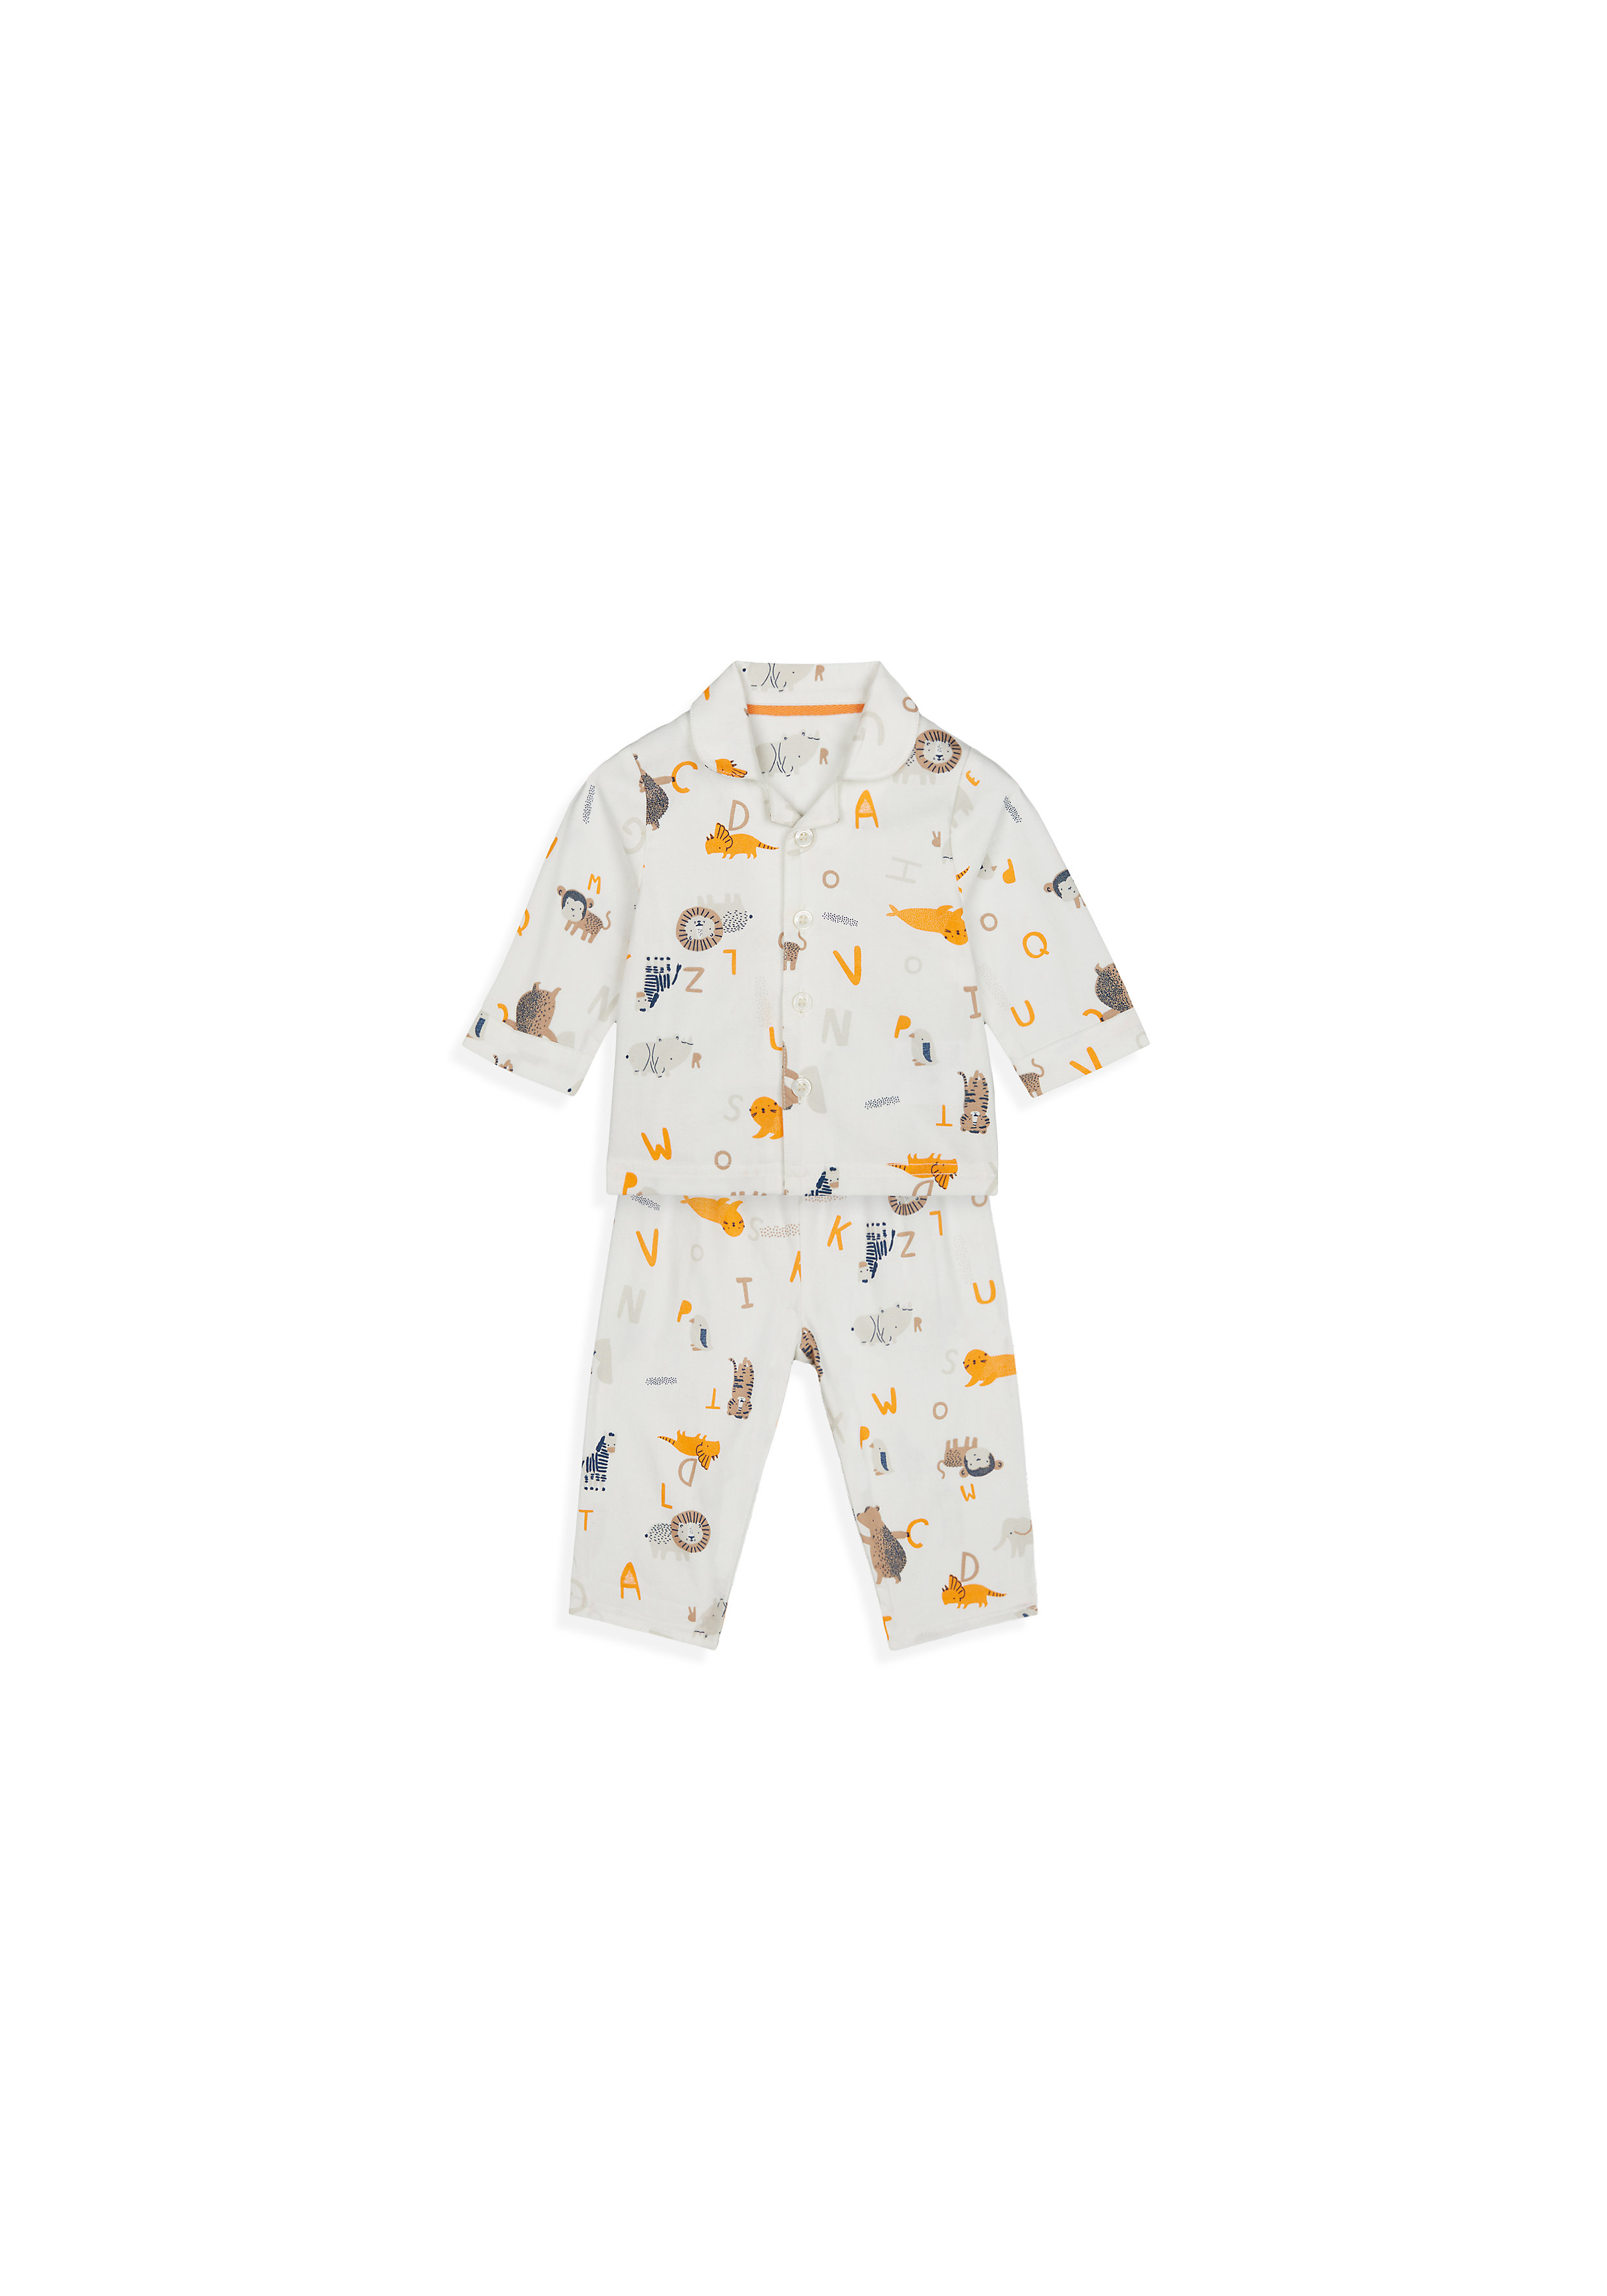 Mothercare | Boys Full Sleeves Pyjama Set Animal Print - White